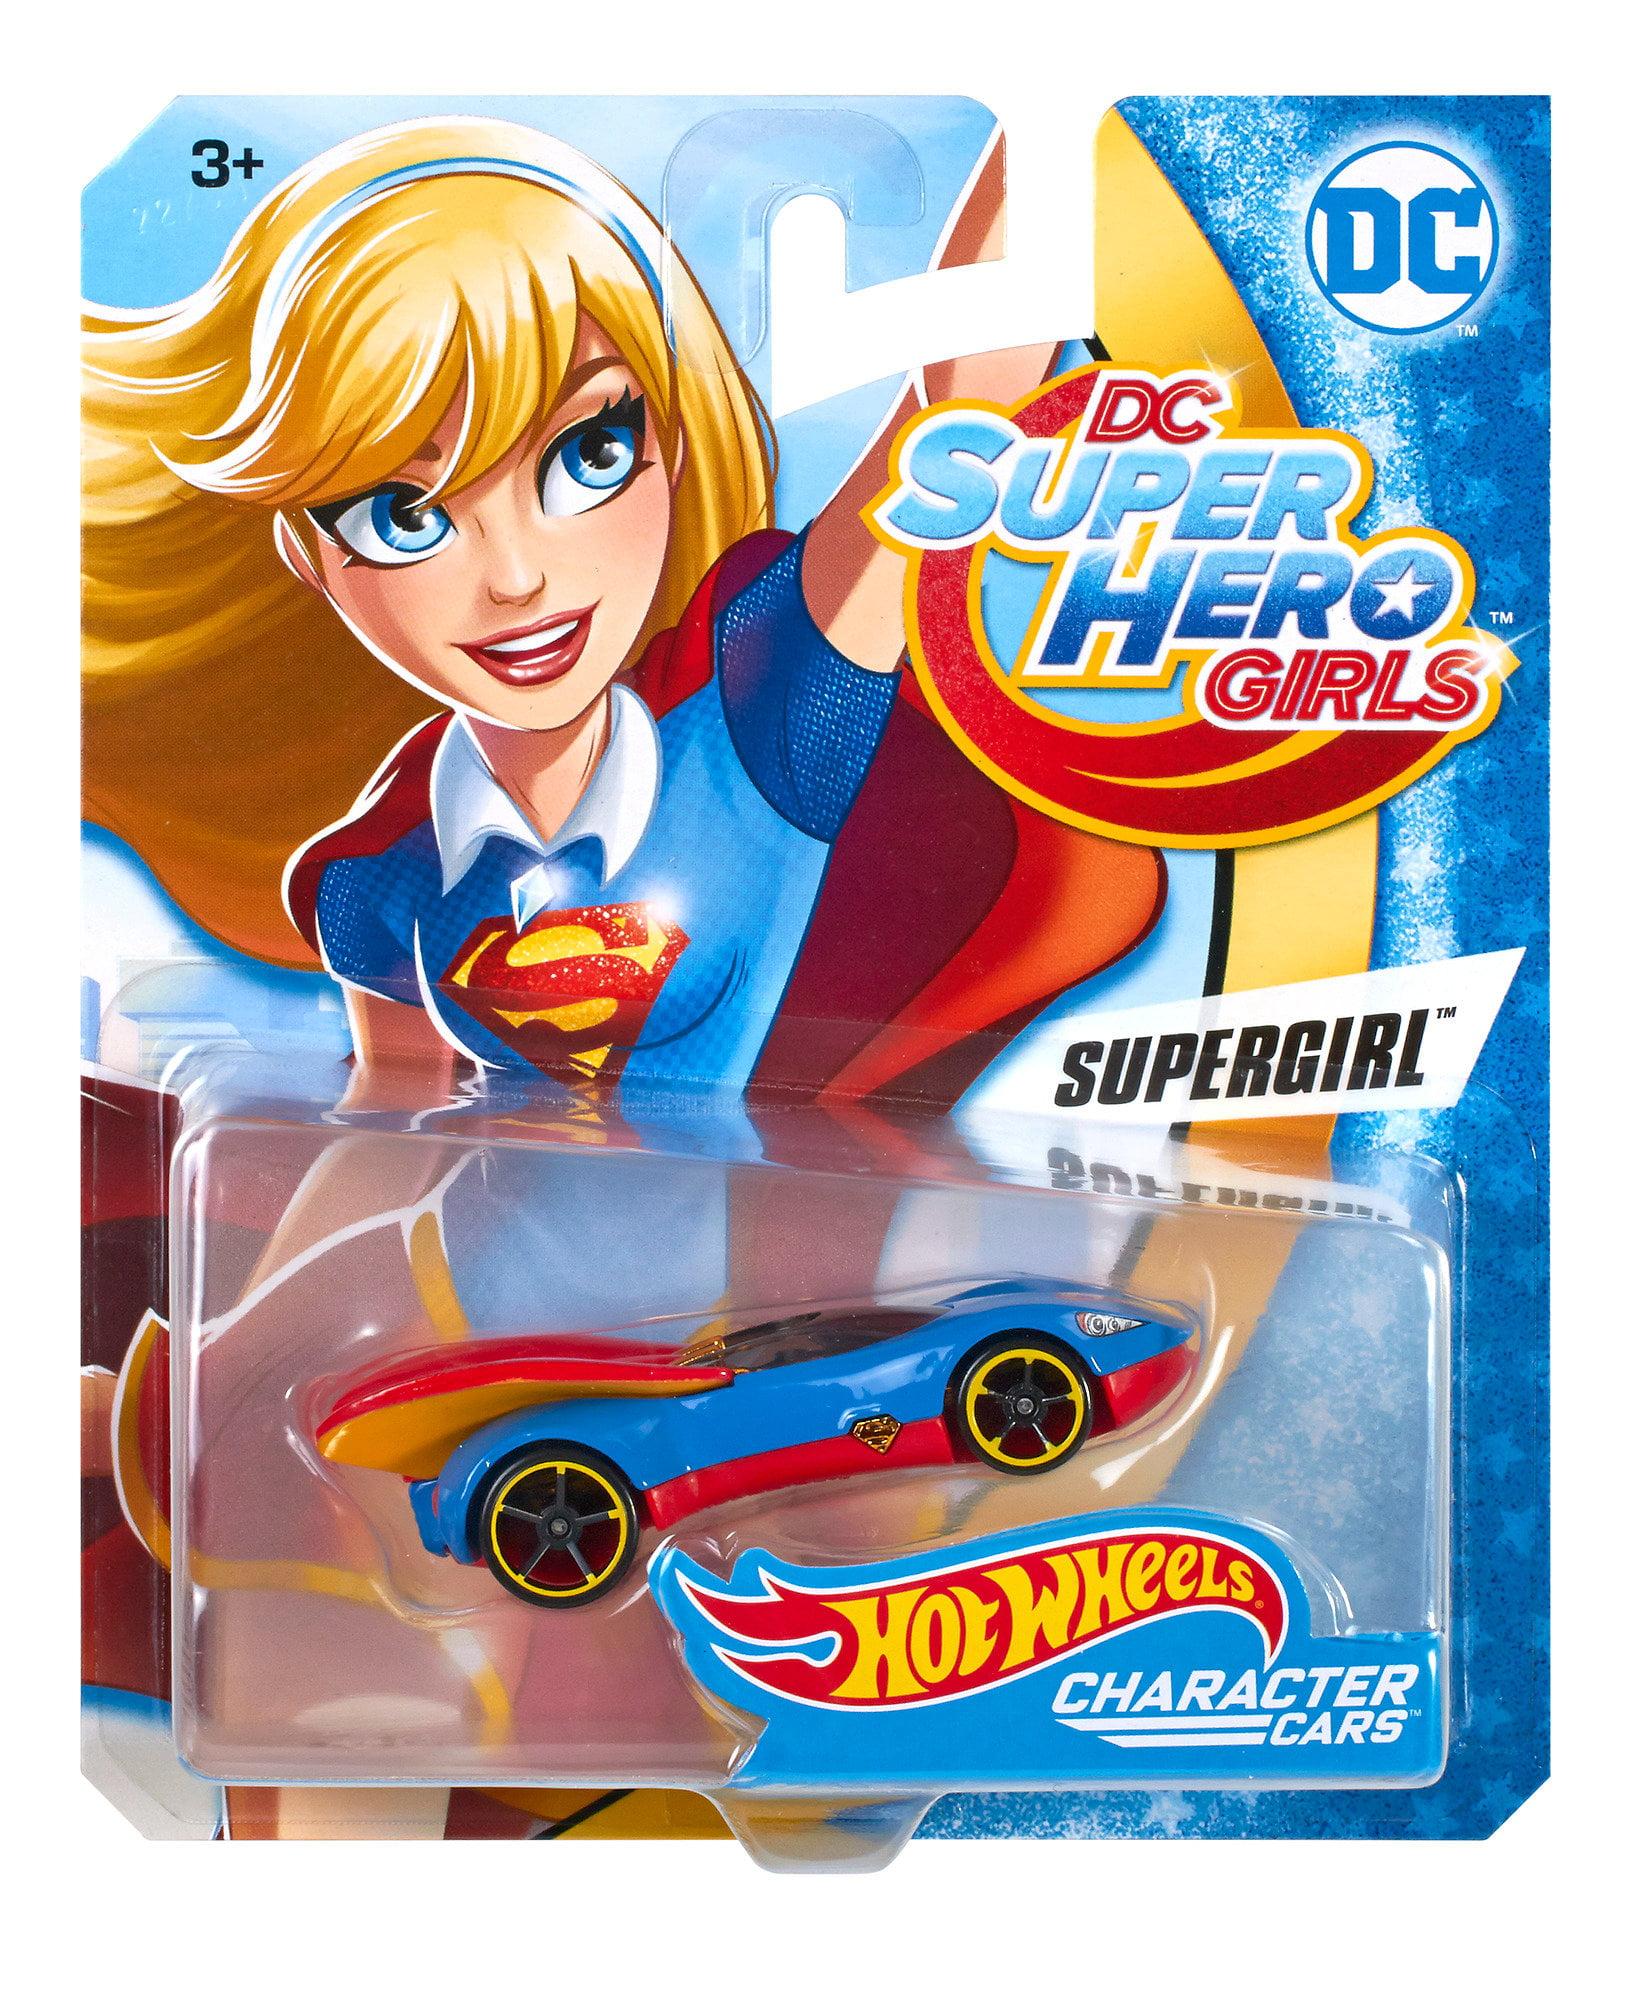 DC Super Hero Girls Hot Wheels Supergirl Character Car by Mattel